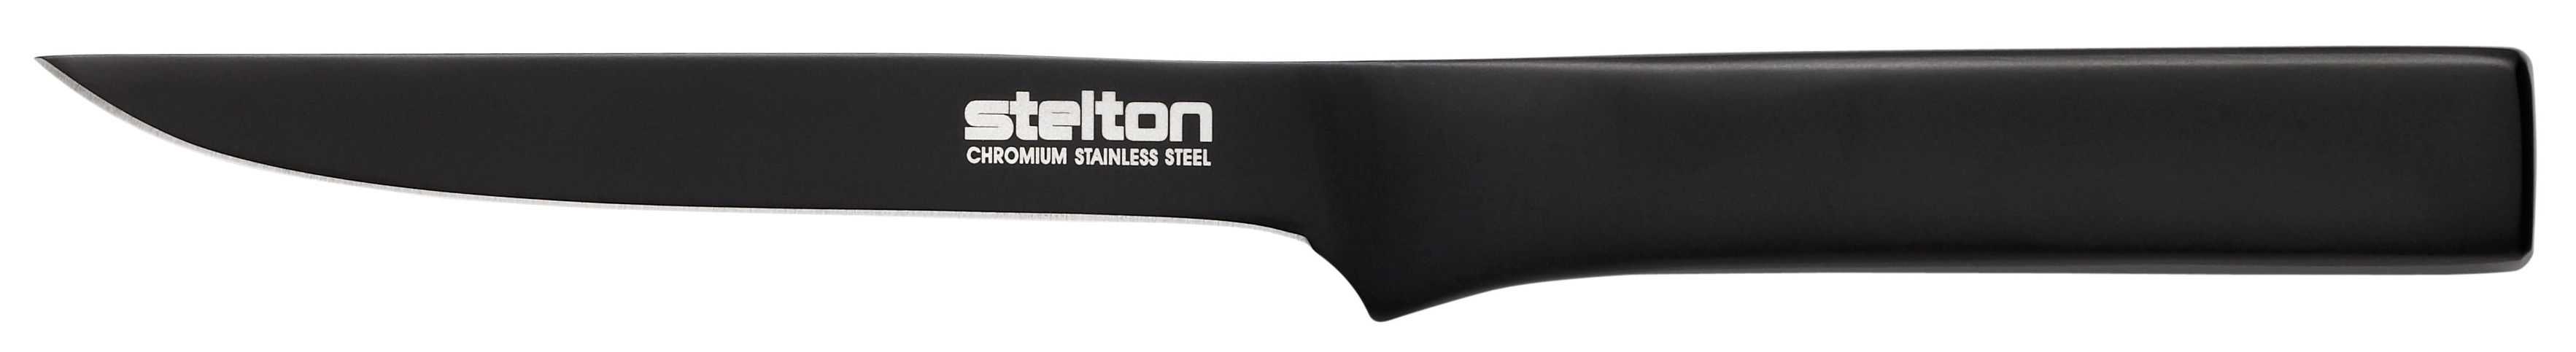 Kitchenware - Kitchen Knives - Pure Black Kitchen knife - To bone by Stelton - Black - Stainless steel